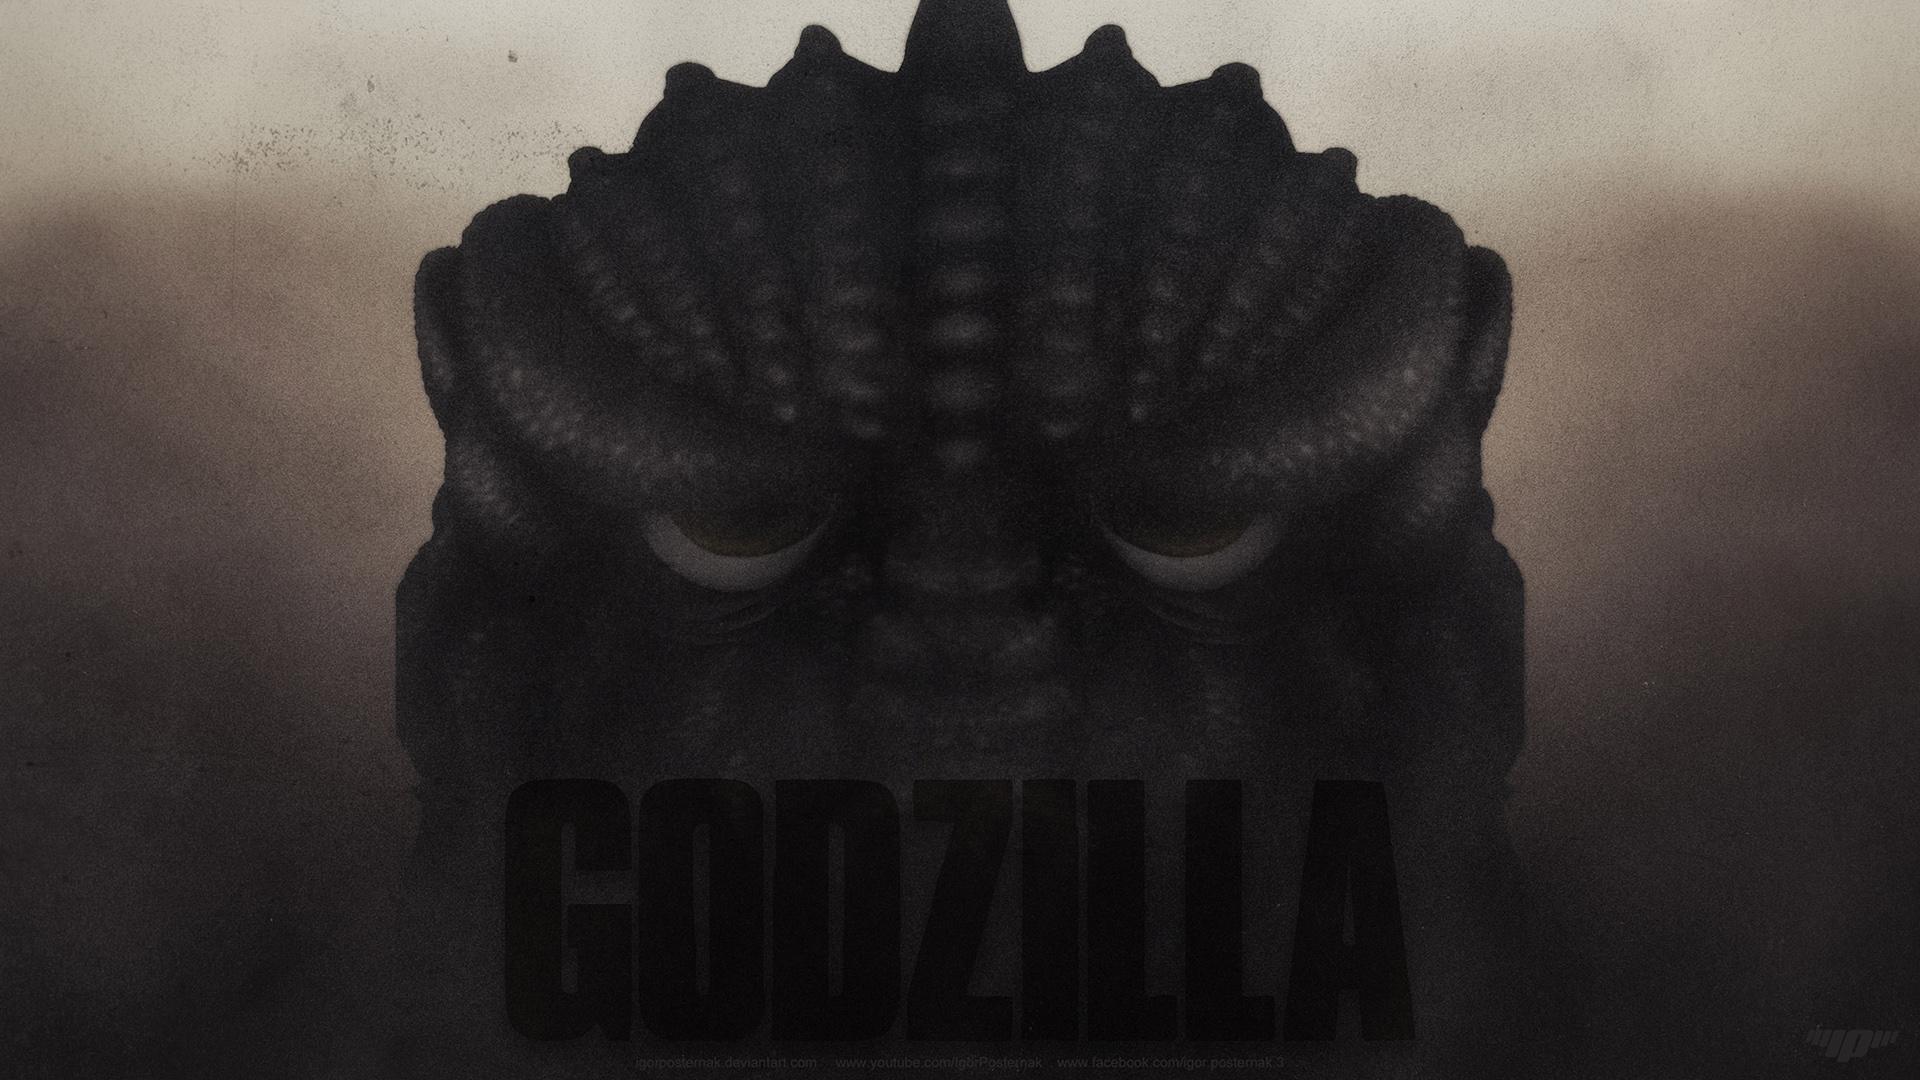 Godzilla 2014 fondos de pantalla Godzilla 2014 fotos gratis 1920x1080